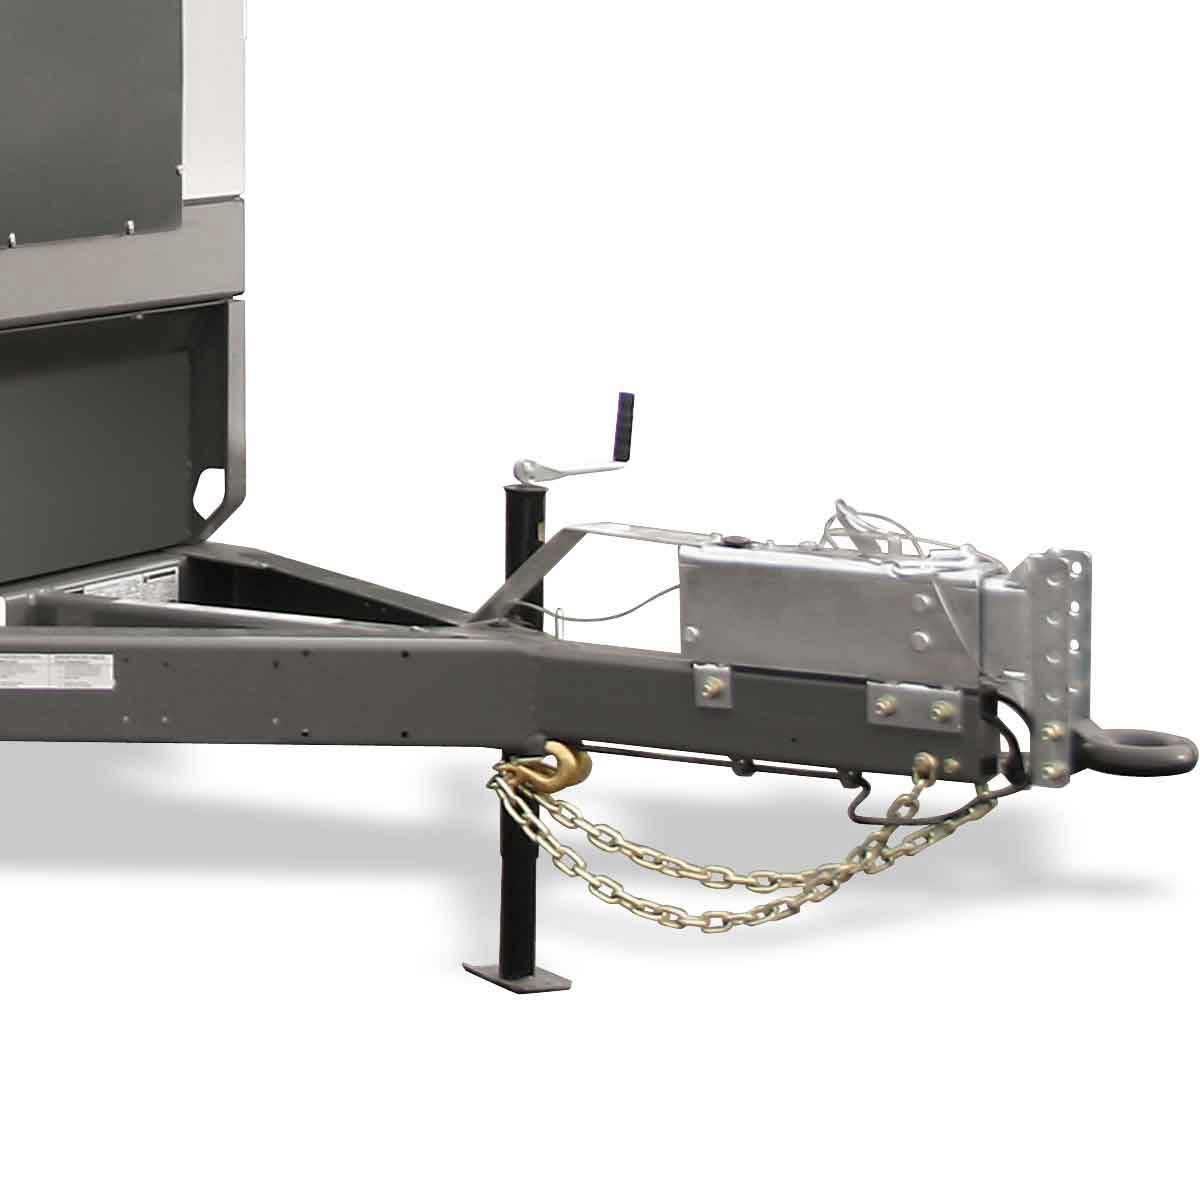 Wacker Neuson G120 mobile generator pintle hitch